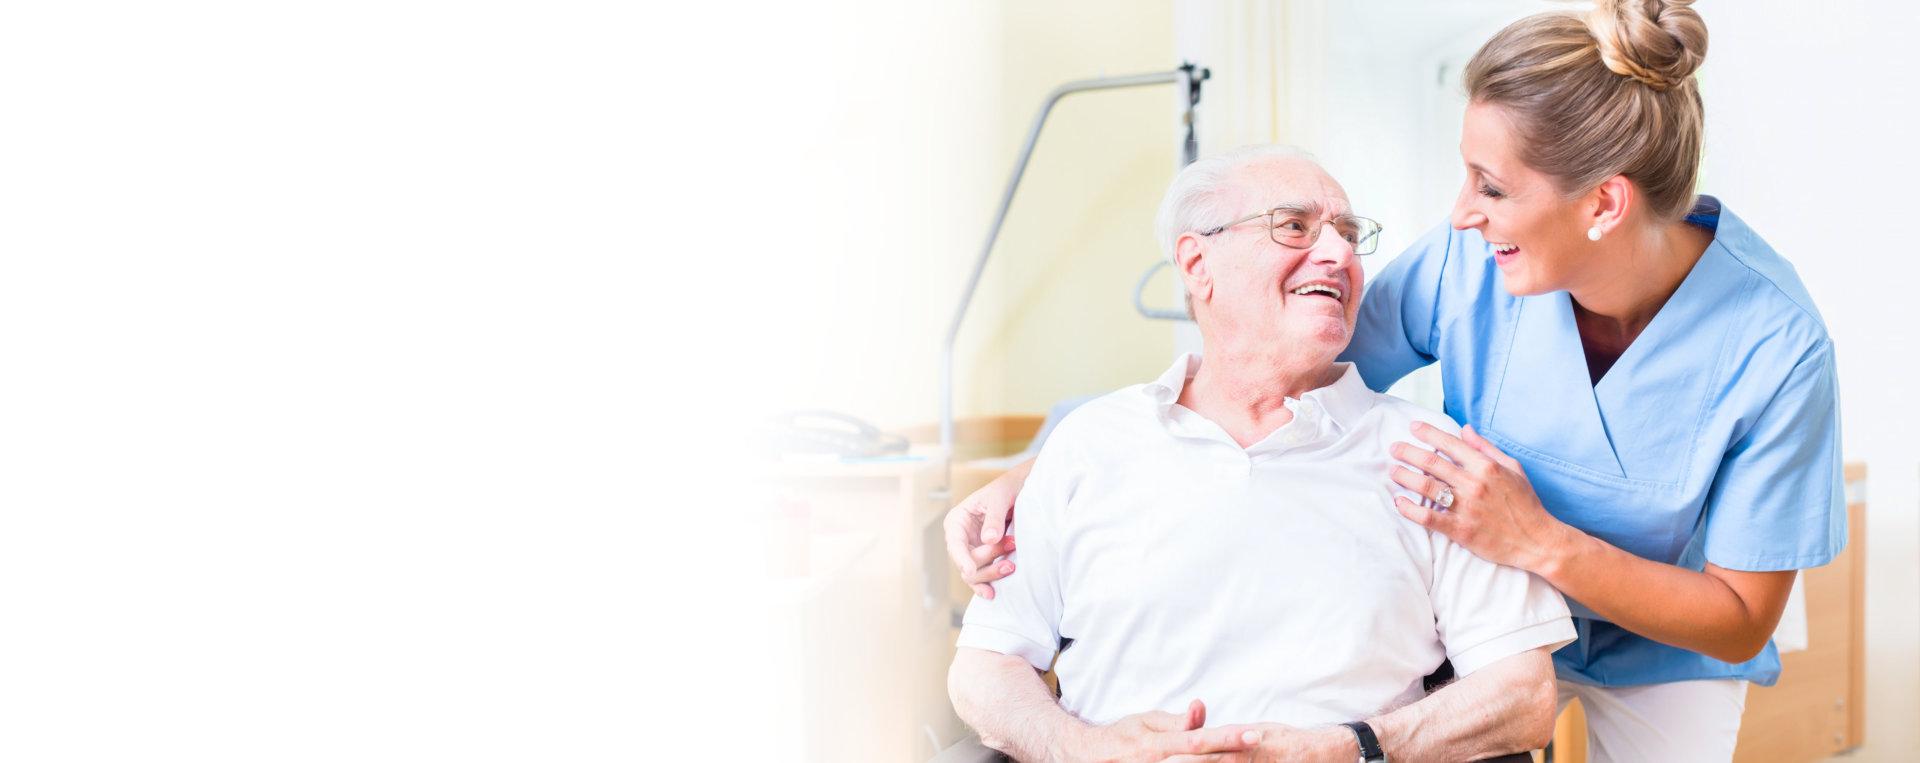 female medical staff with senior man smiling